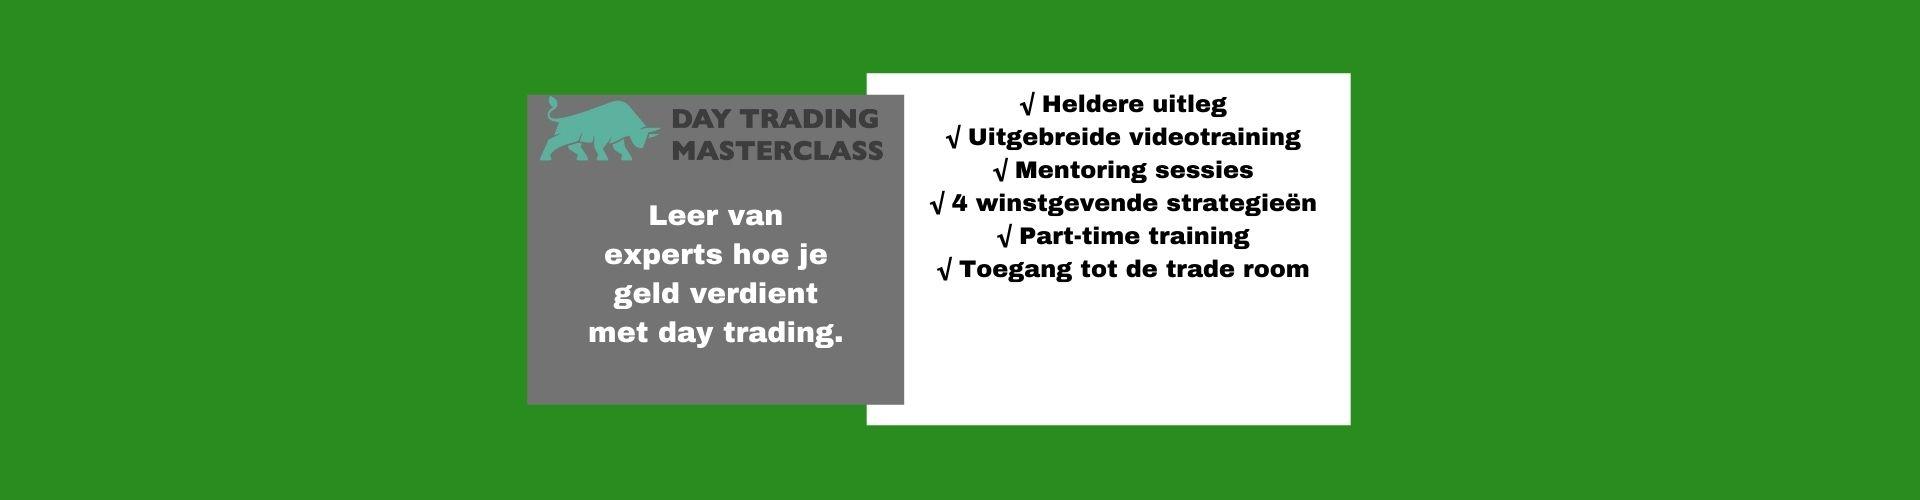 Day trading masterclass samenvatting